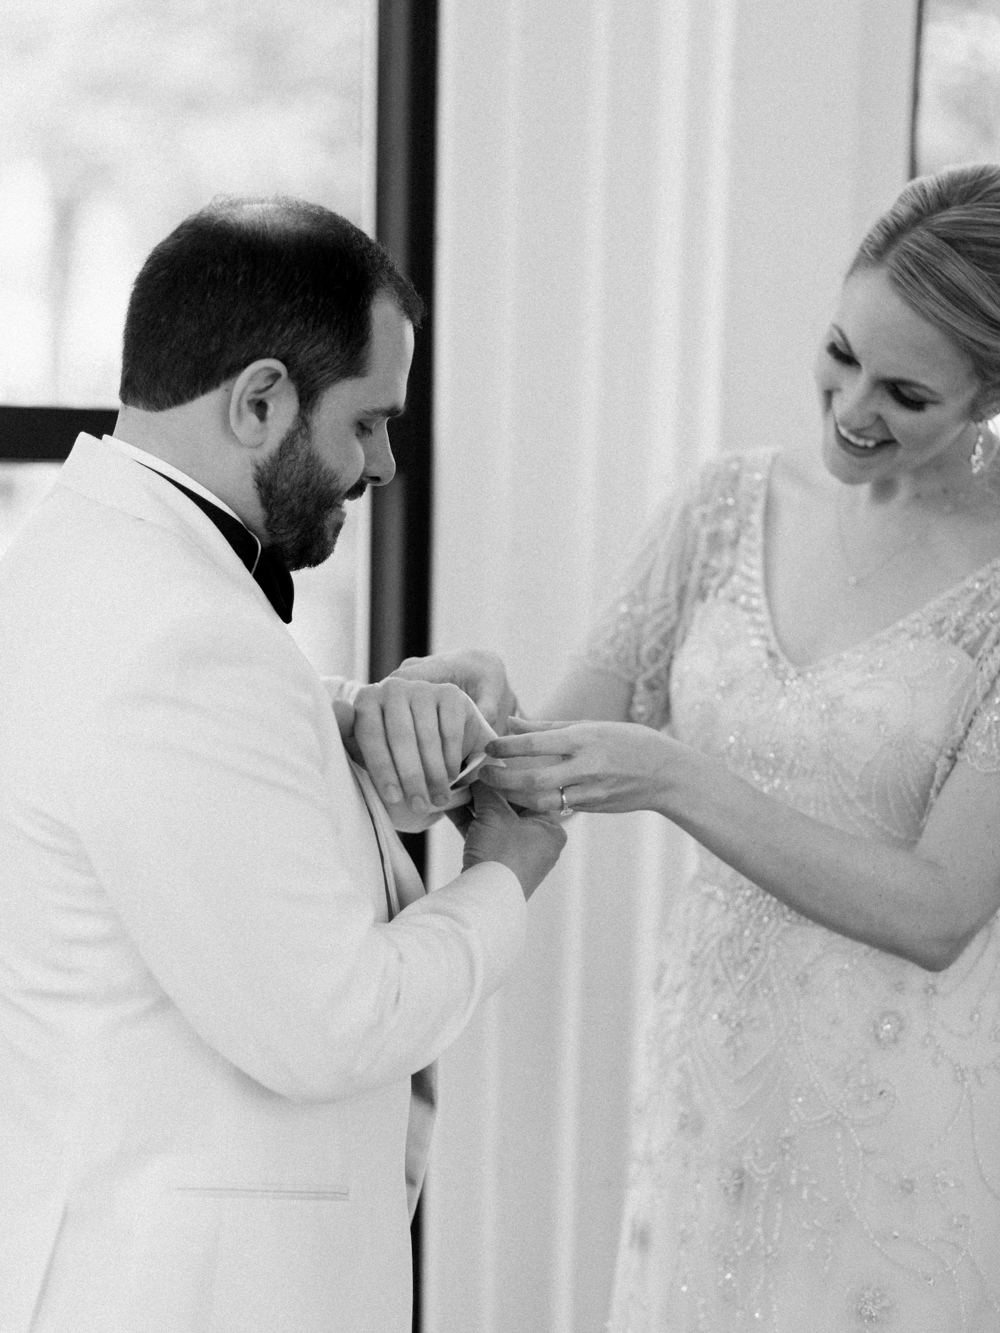 benefits of a first look_wedding photography_wedding photographer_film wedding photographer_Christine Gosch_www.christinegosch.com_Houston, Texas wedding photographer_ Houston, Texas-24.jpg